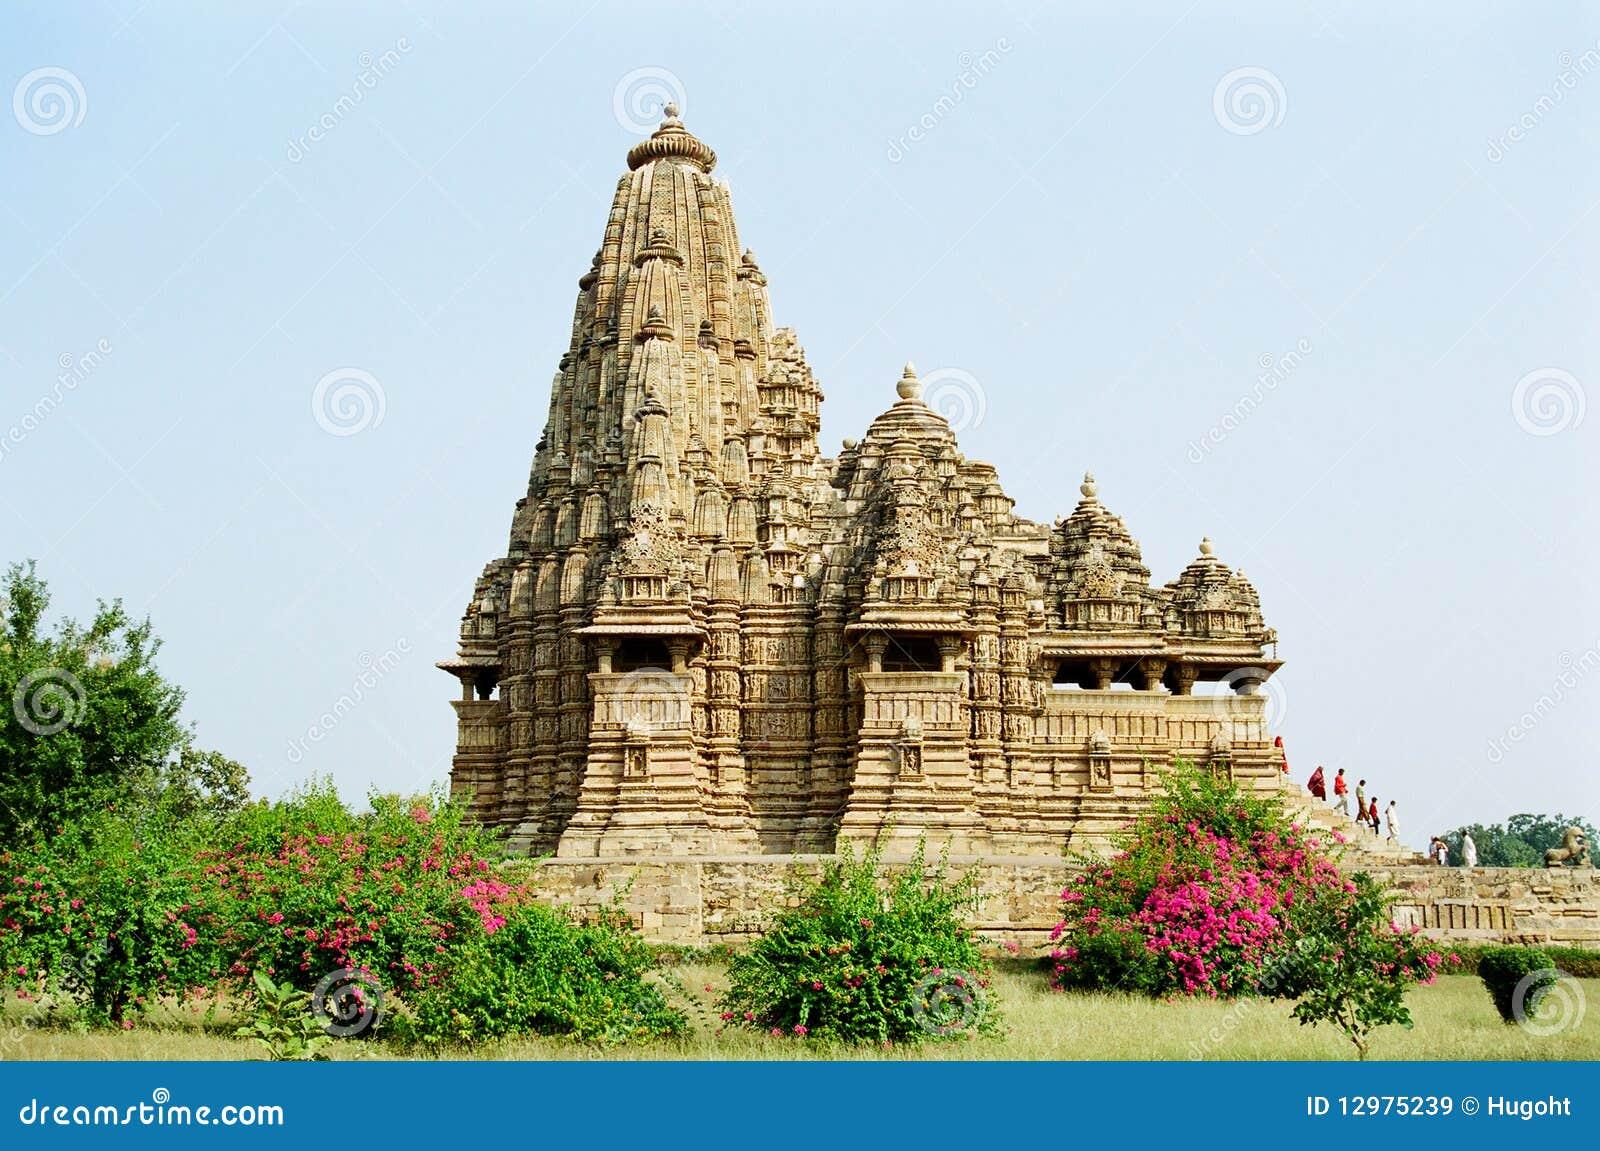 India Erotic Temples In Khajuraho Stock Image - Image Of Architecture, Kamasutra 12975239-3029